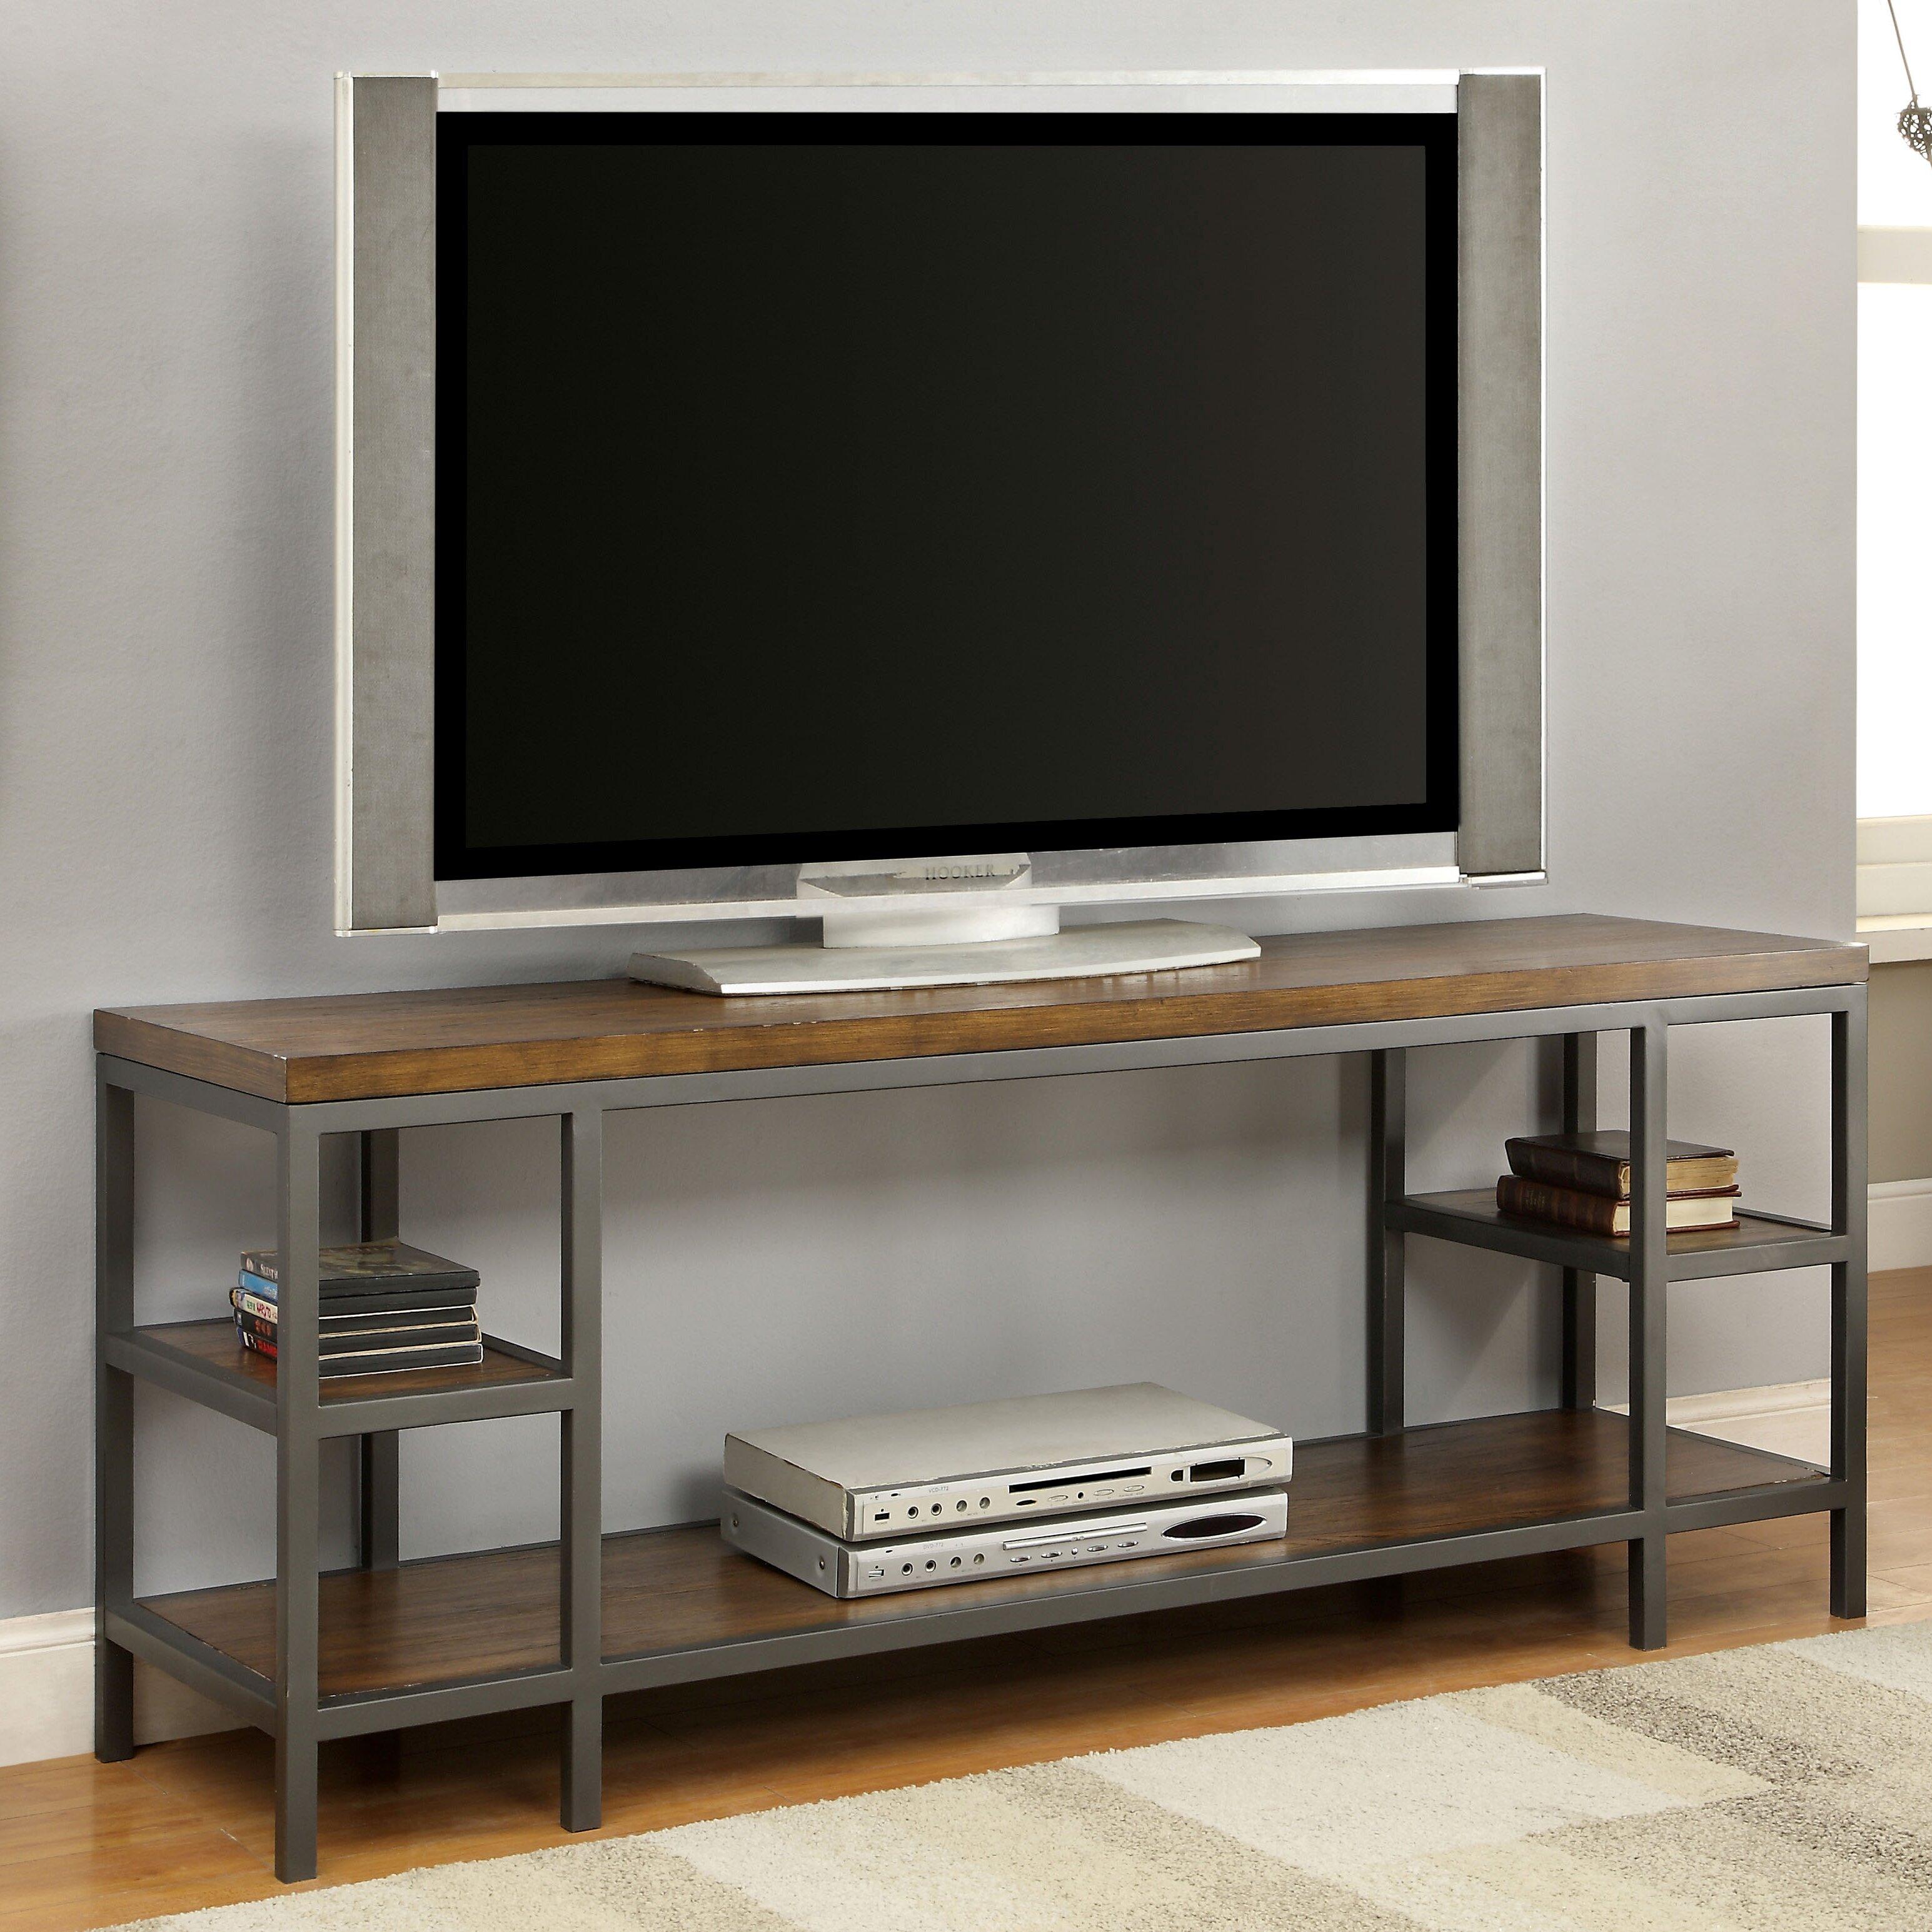 Hokku Designs Hokku Designs Kizan Tv Stand Reviews Wayfair